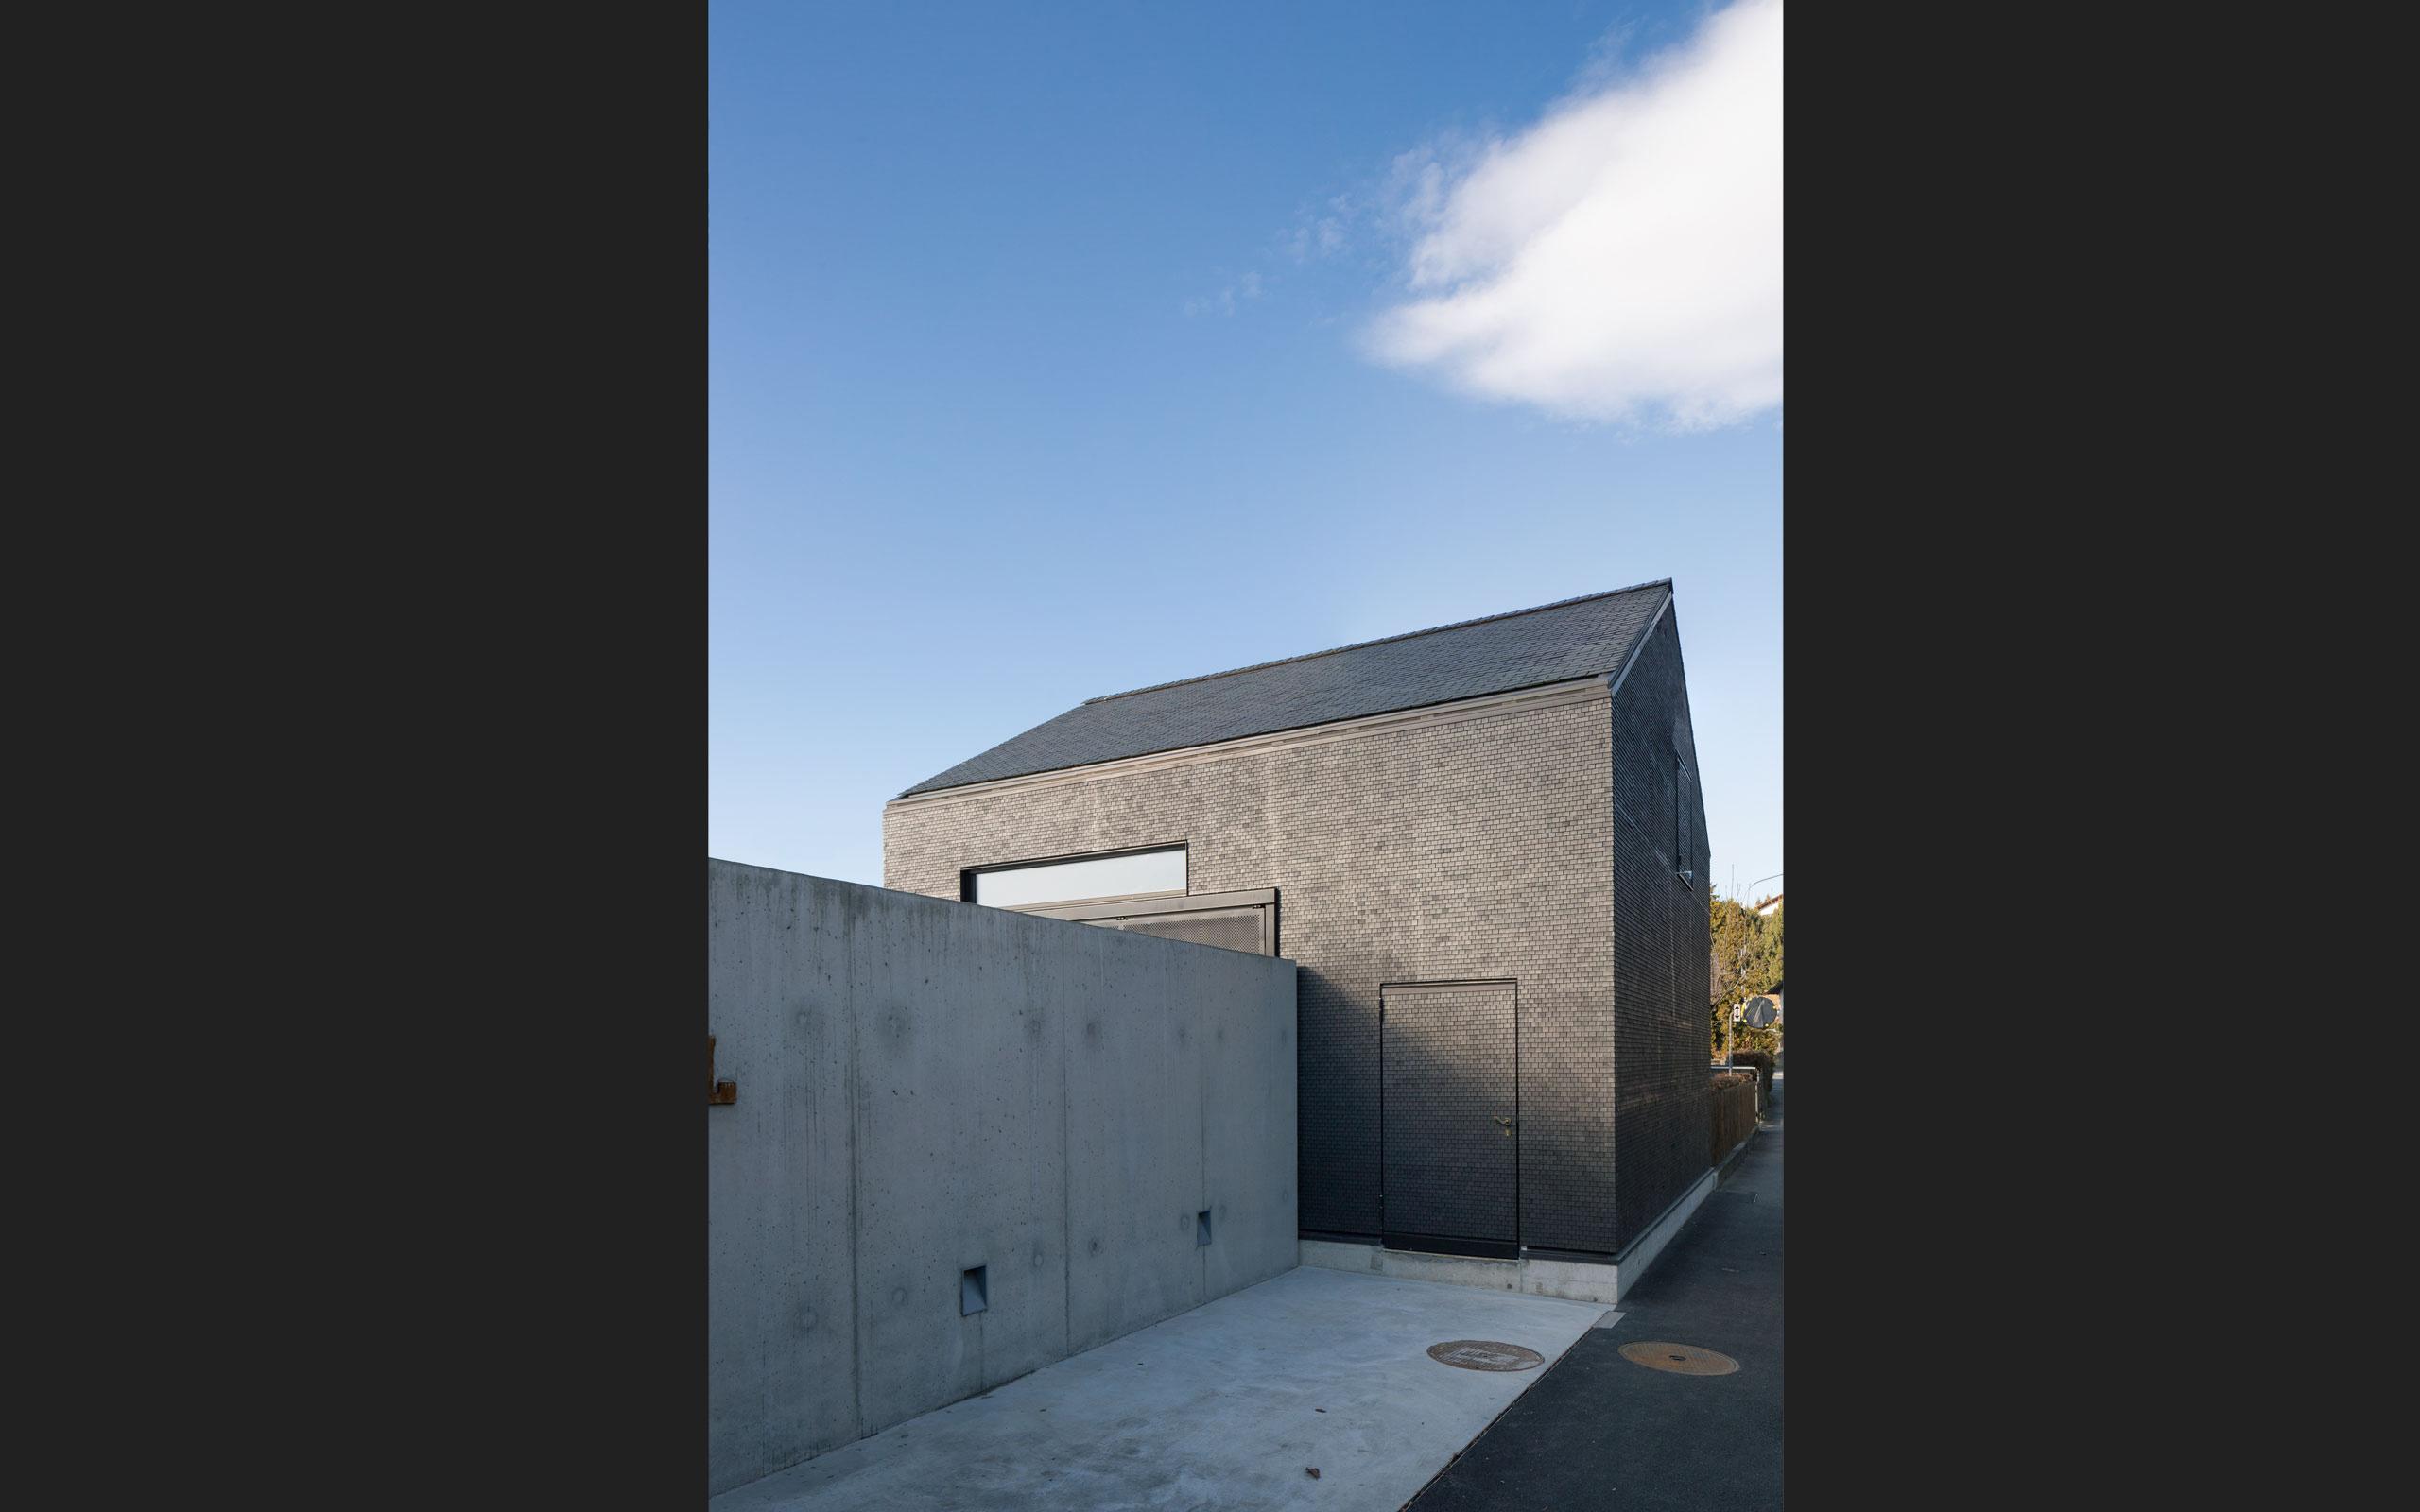 Architektur: tzarch.ch, Thun, Bootshaus_Huenibach